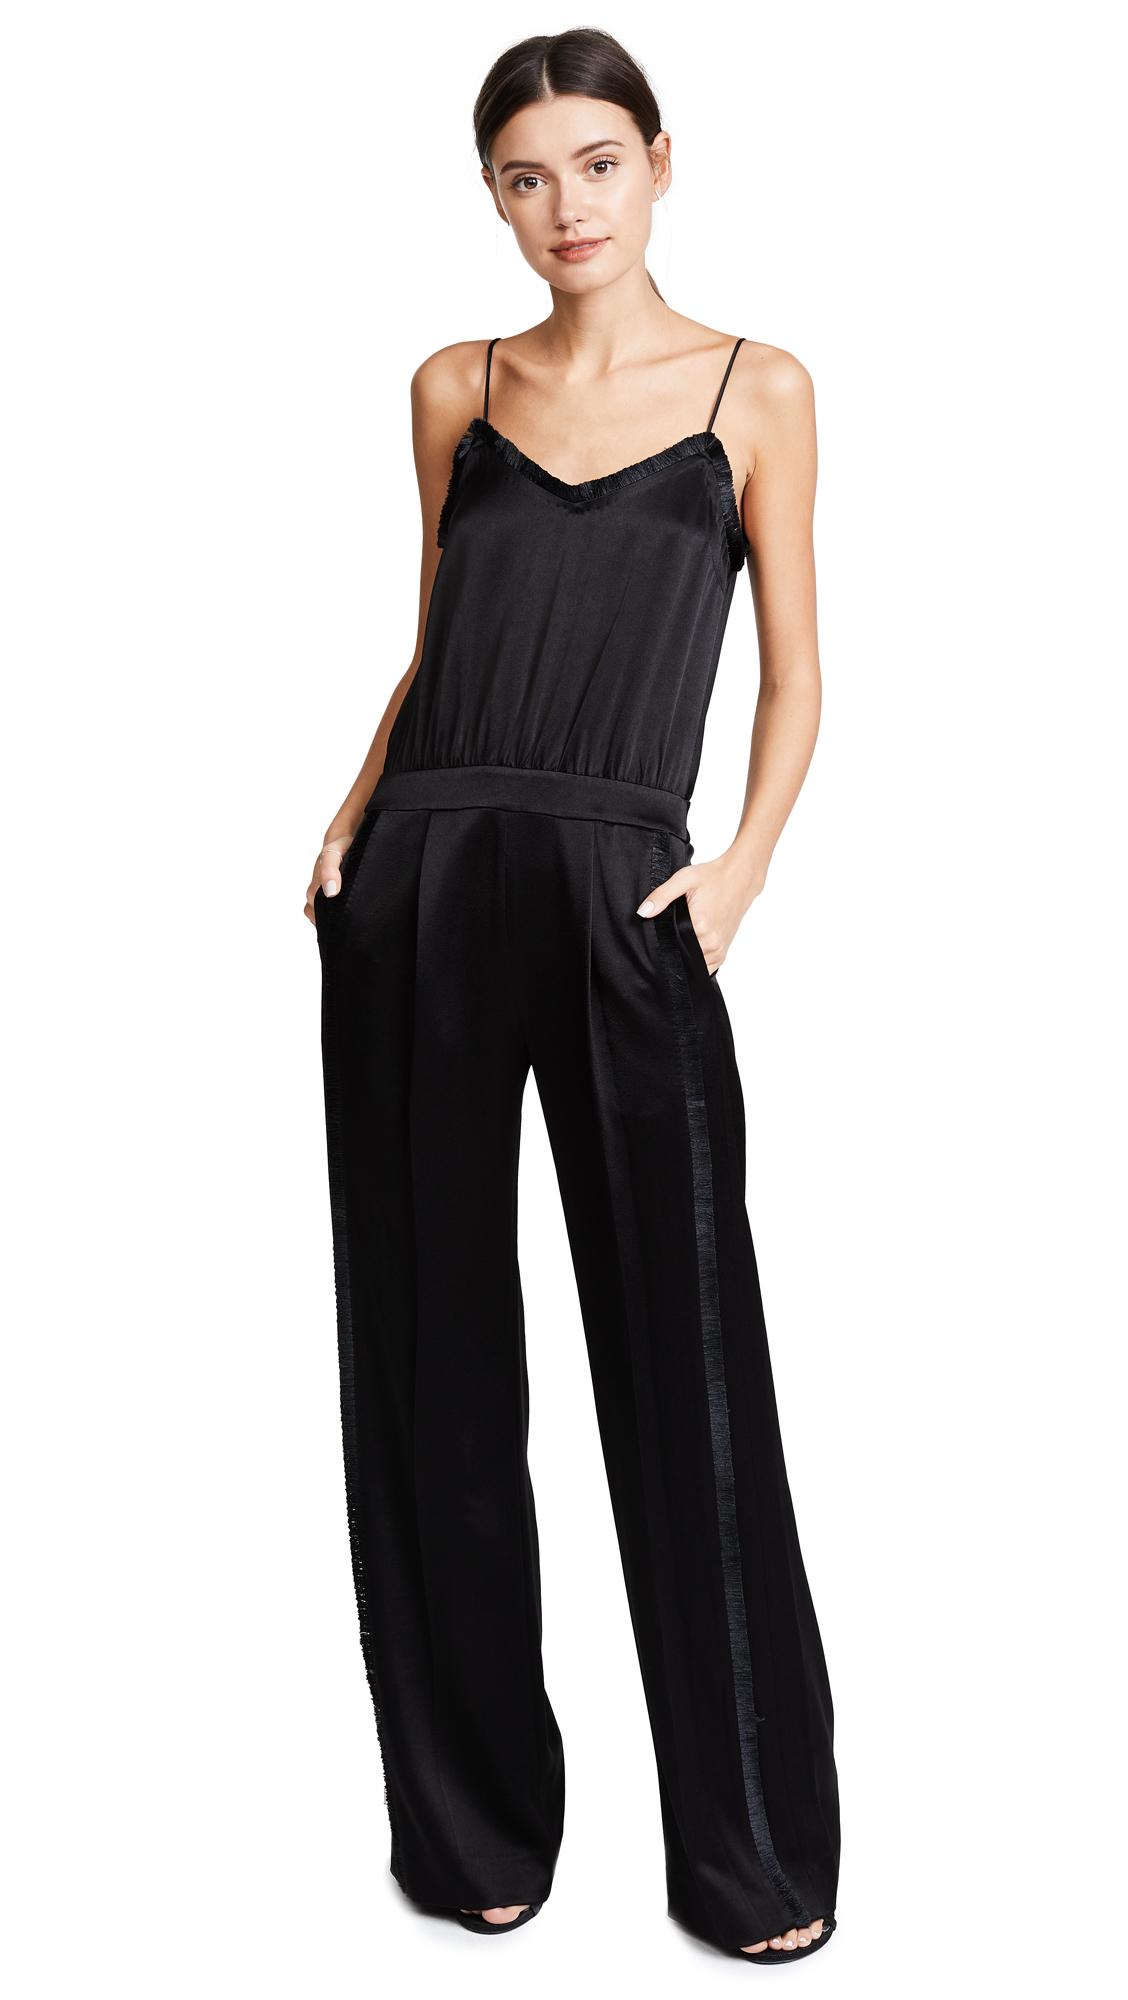 Derek Lam 10 Crosby Cami Jumpsuit - Black